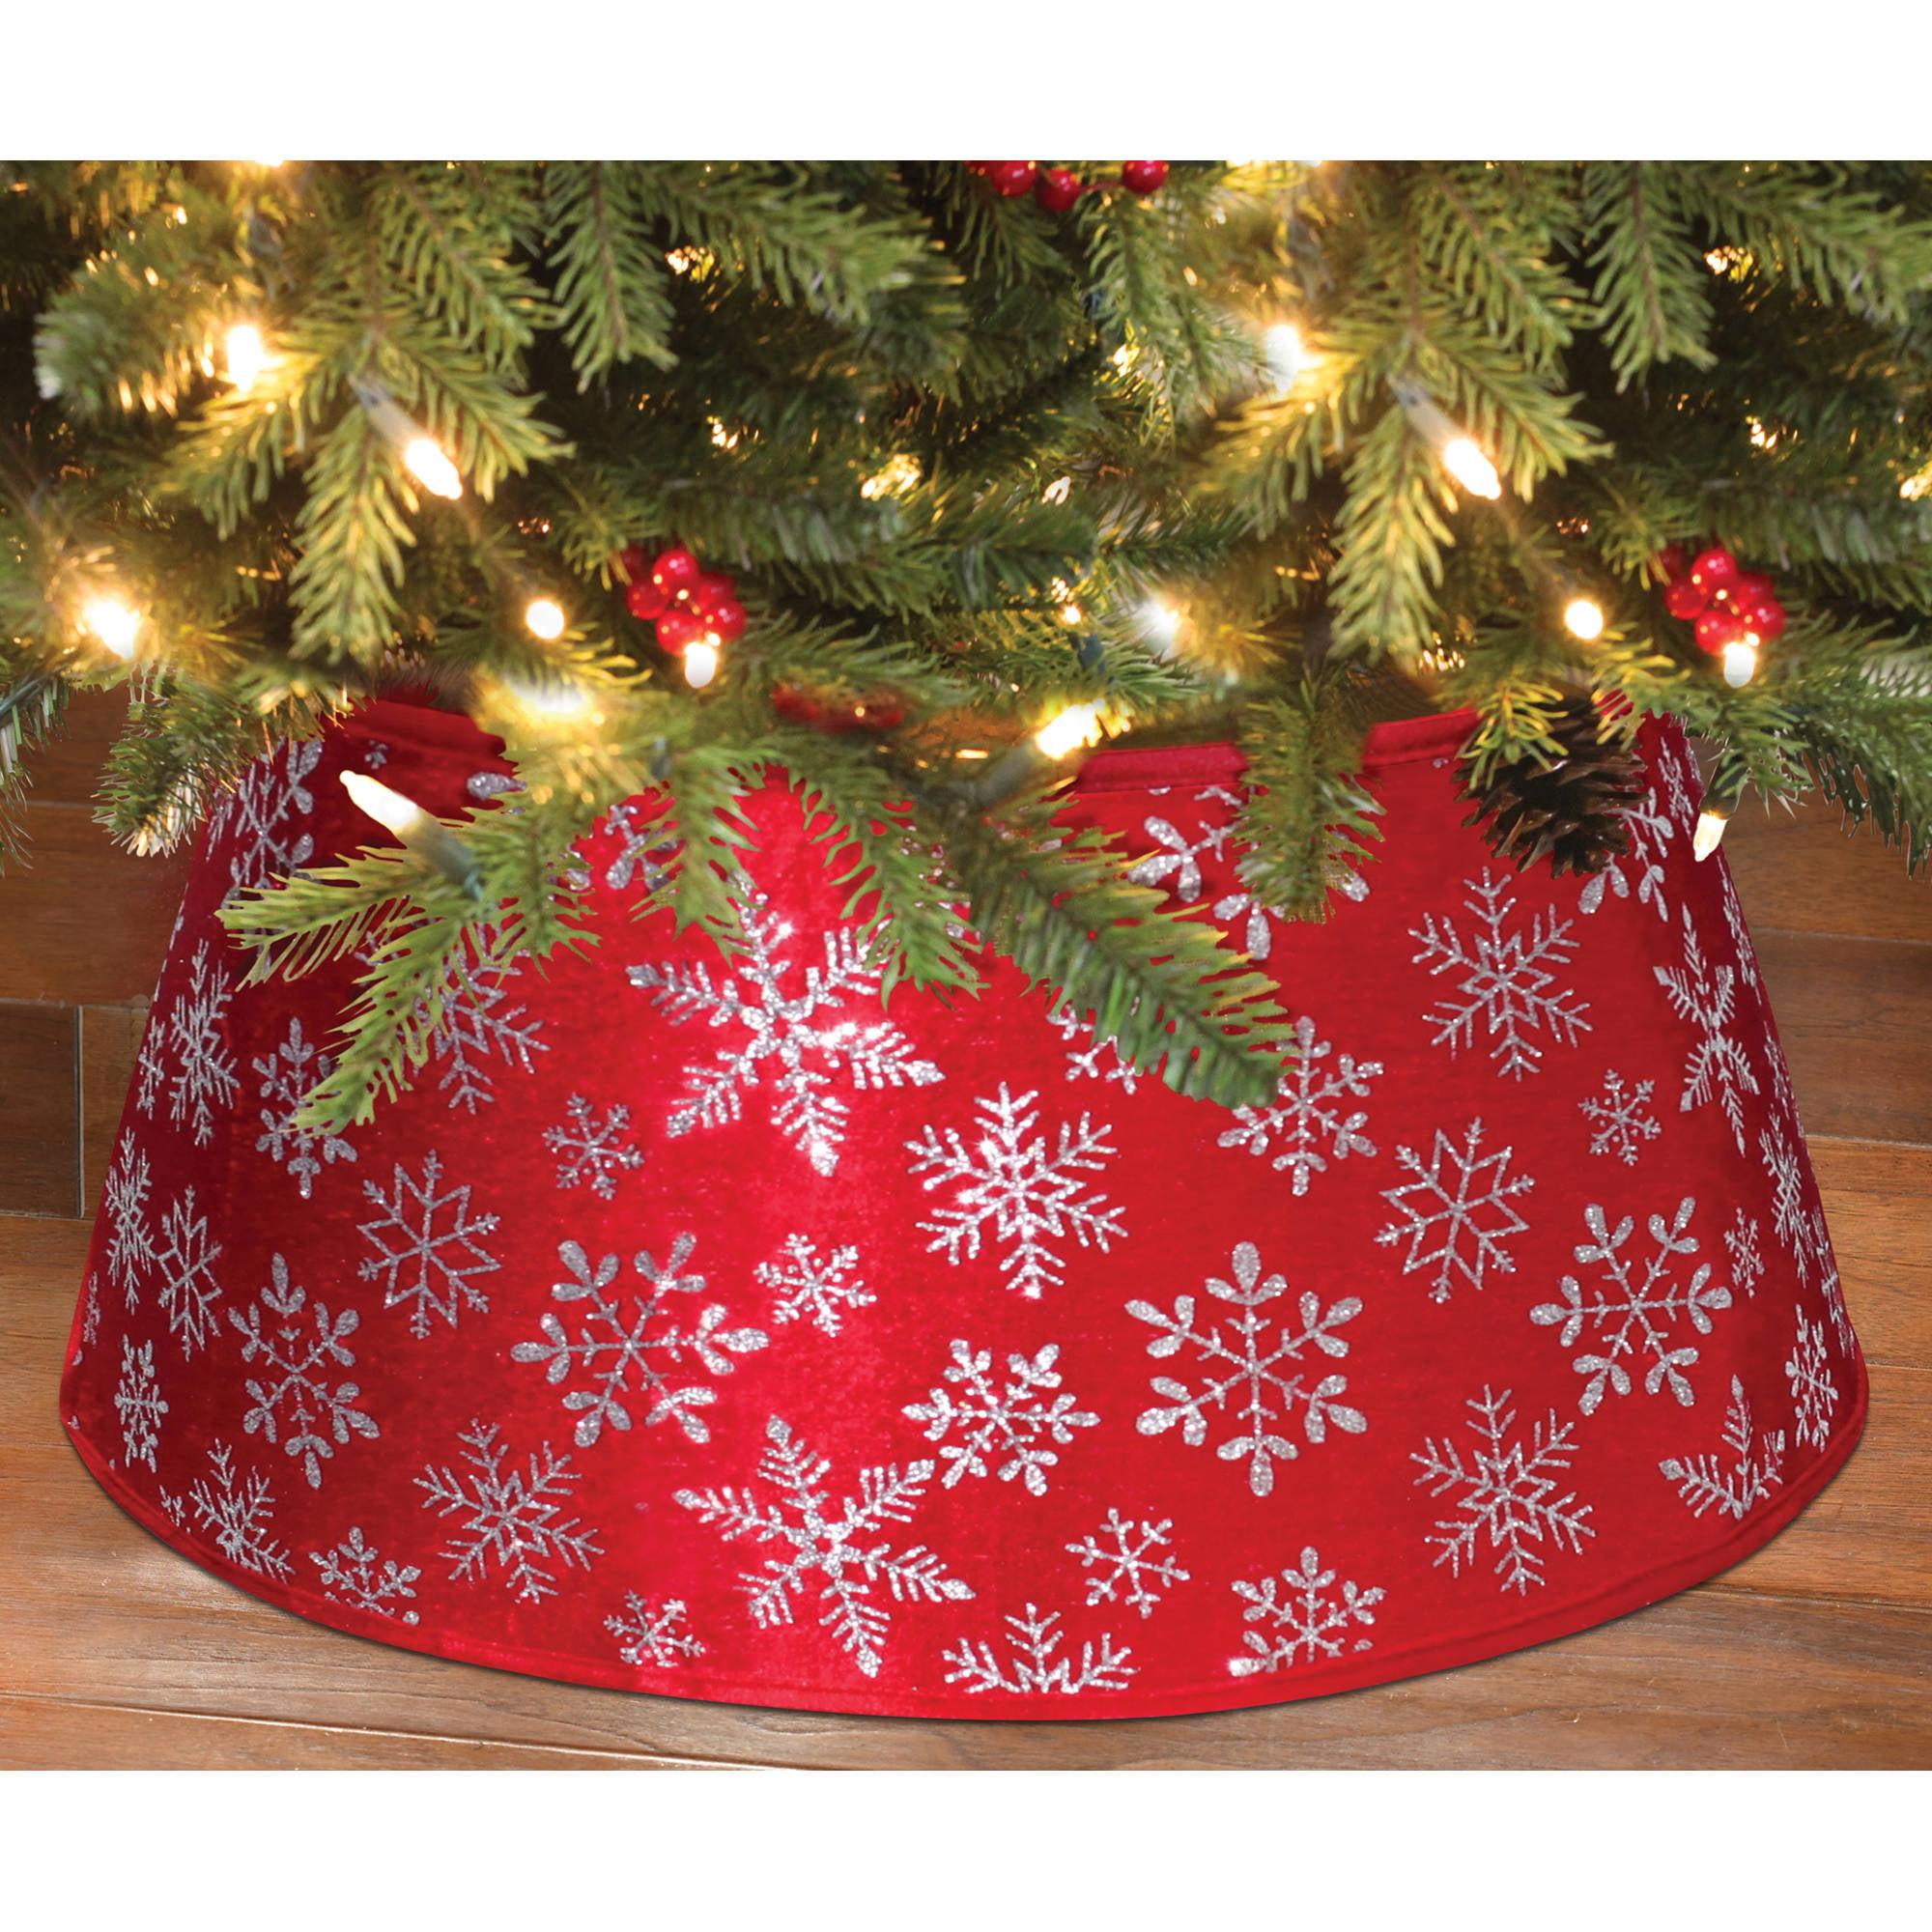 Holiday Time Christmas Decor 22 Red Snowflake Velvet Stand Band Tree Stand Cover Walmart Com Walmart Com